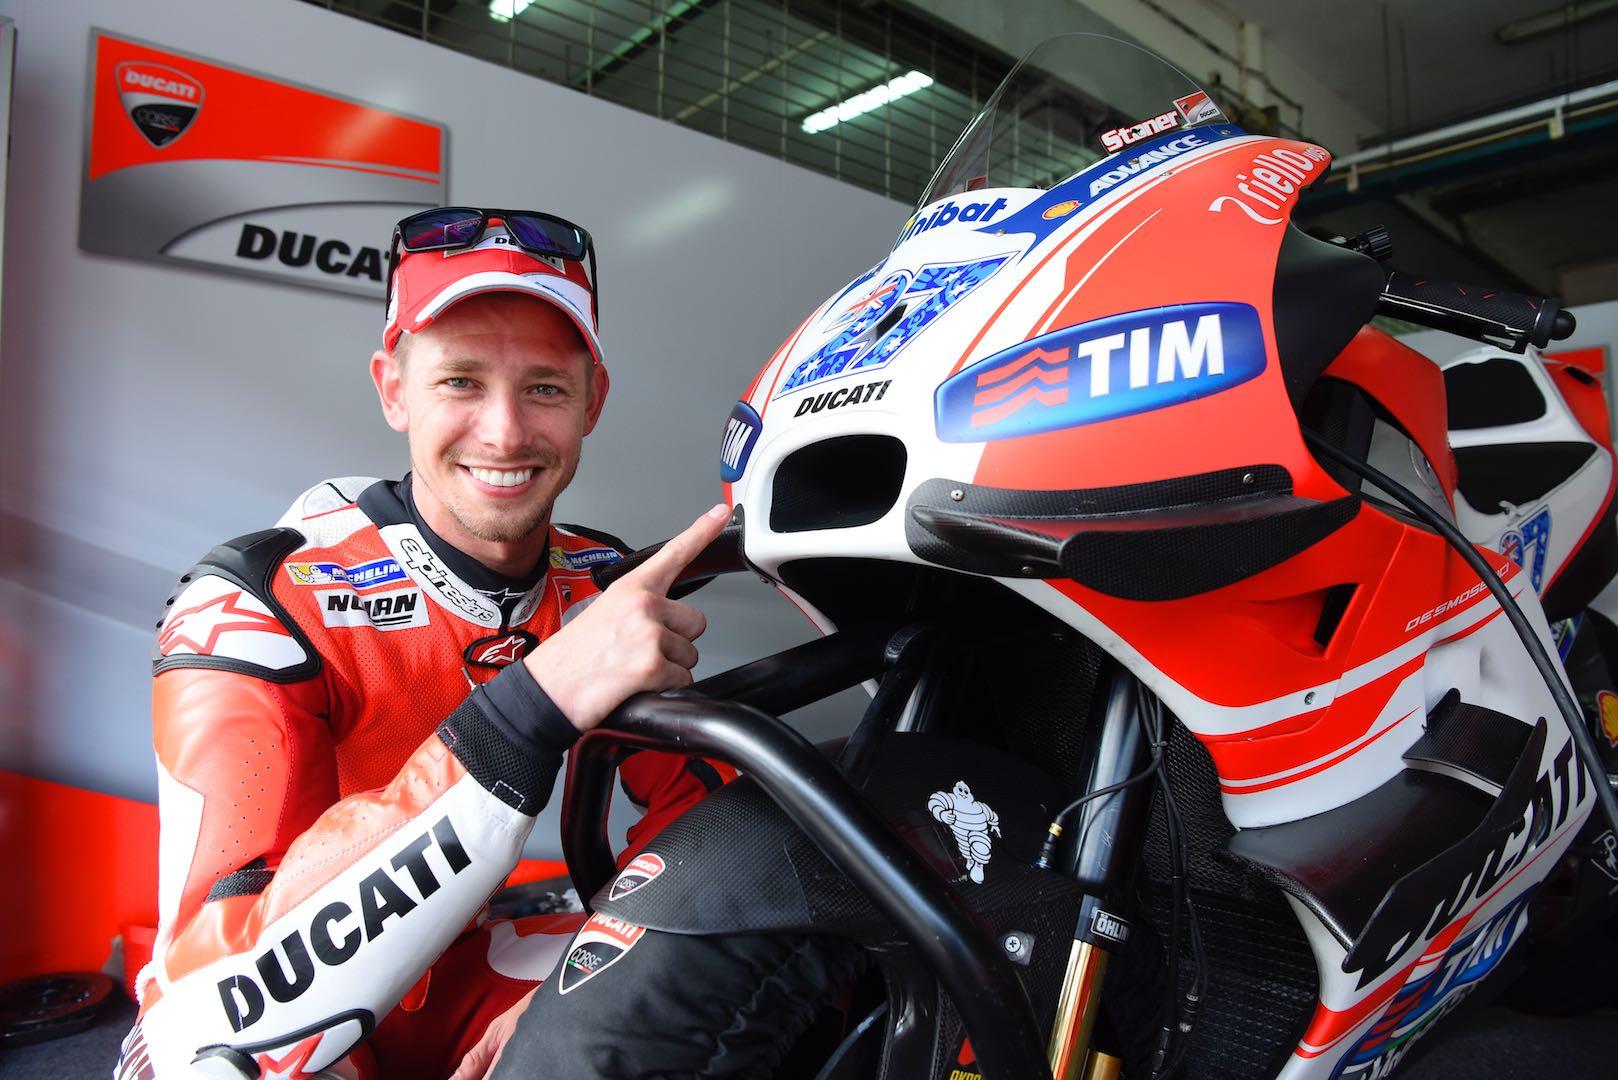 Casey Stoner & Ducati Part Ways (Brand Ambassador and Tester)